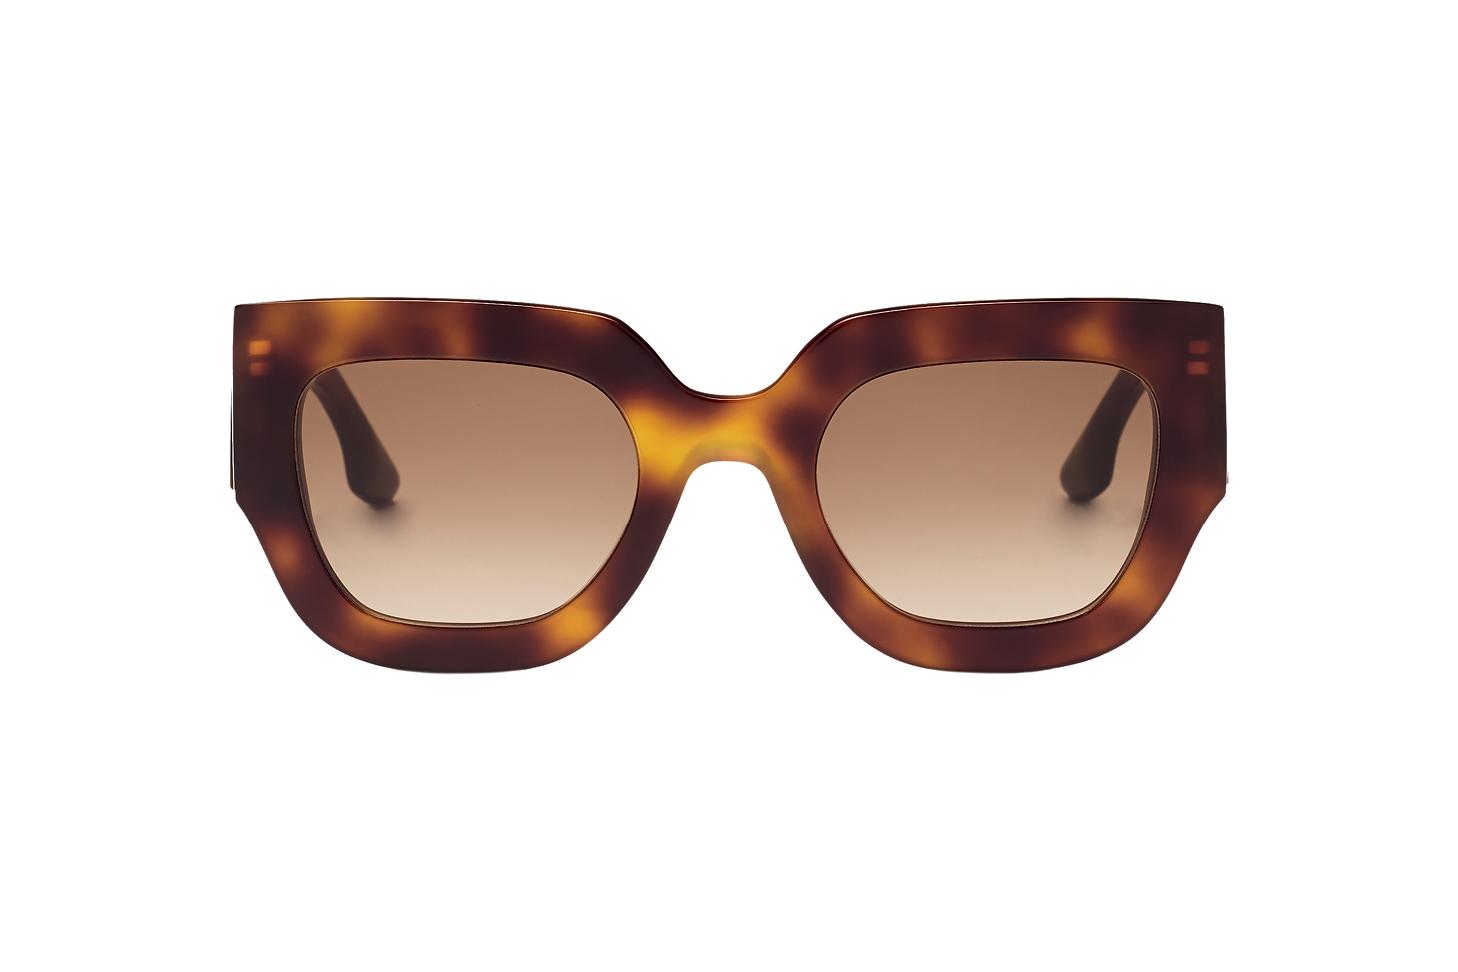 Victoria Beckham Wide Flat Square Sunglasses